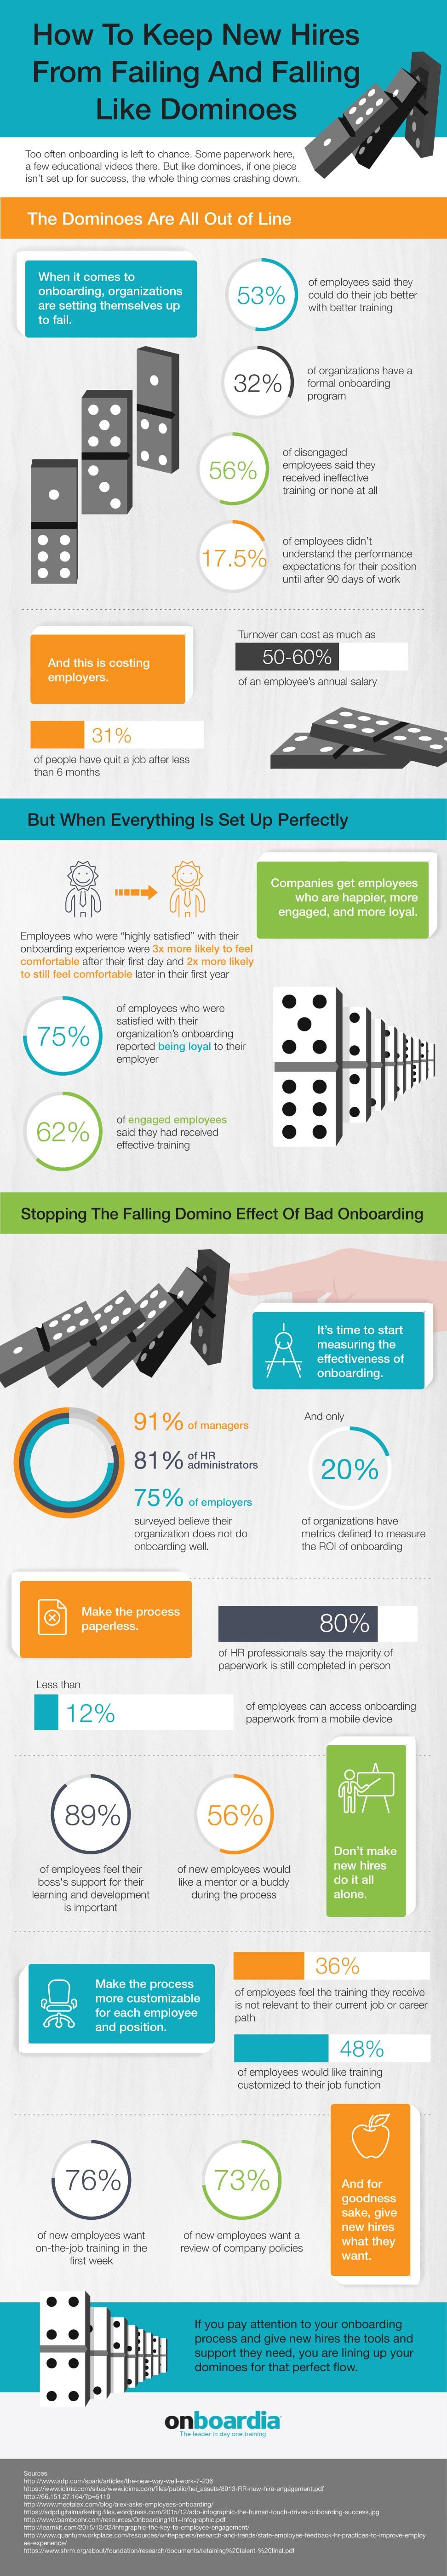 Onboardia - Infographic